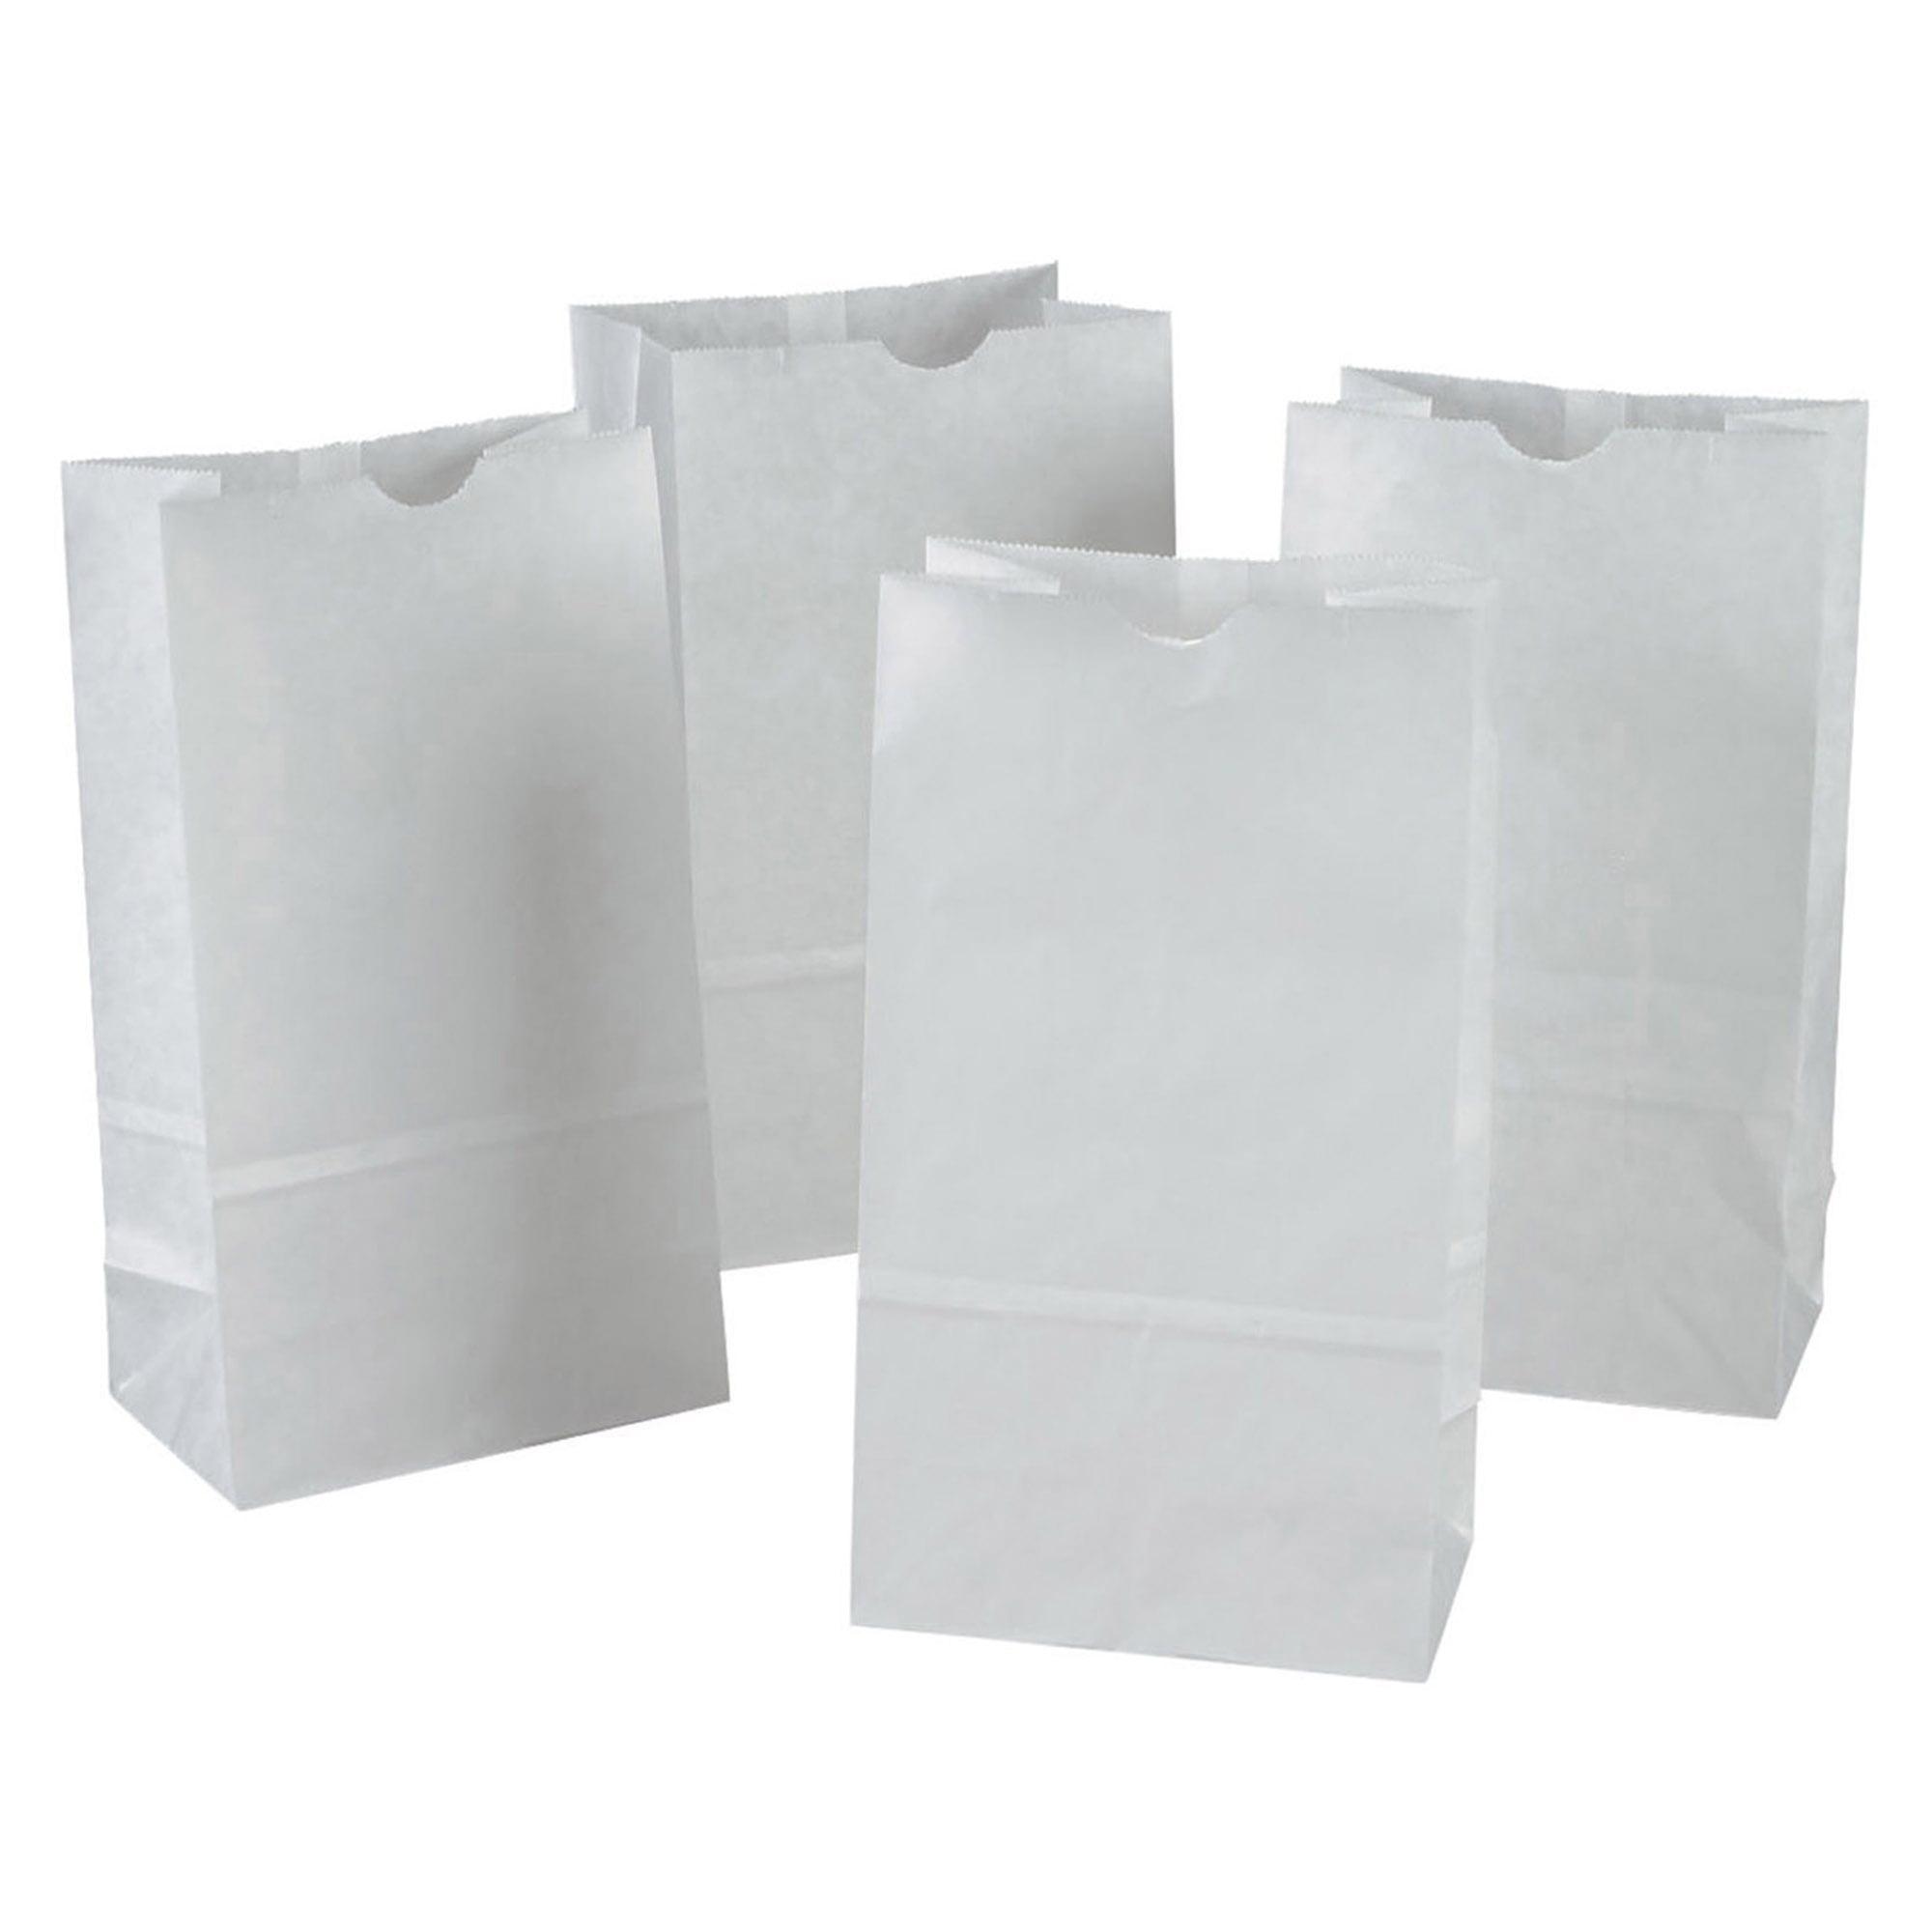 100 Paper Bags Paper Bags Paper Carrier Bags Bag White 22x10x28 cm 70628